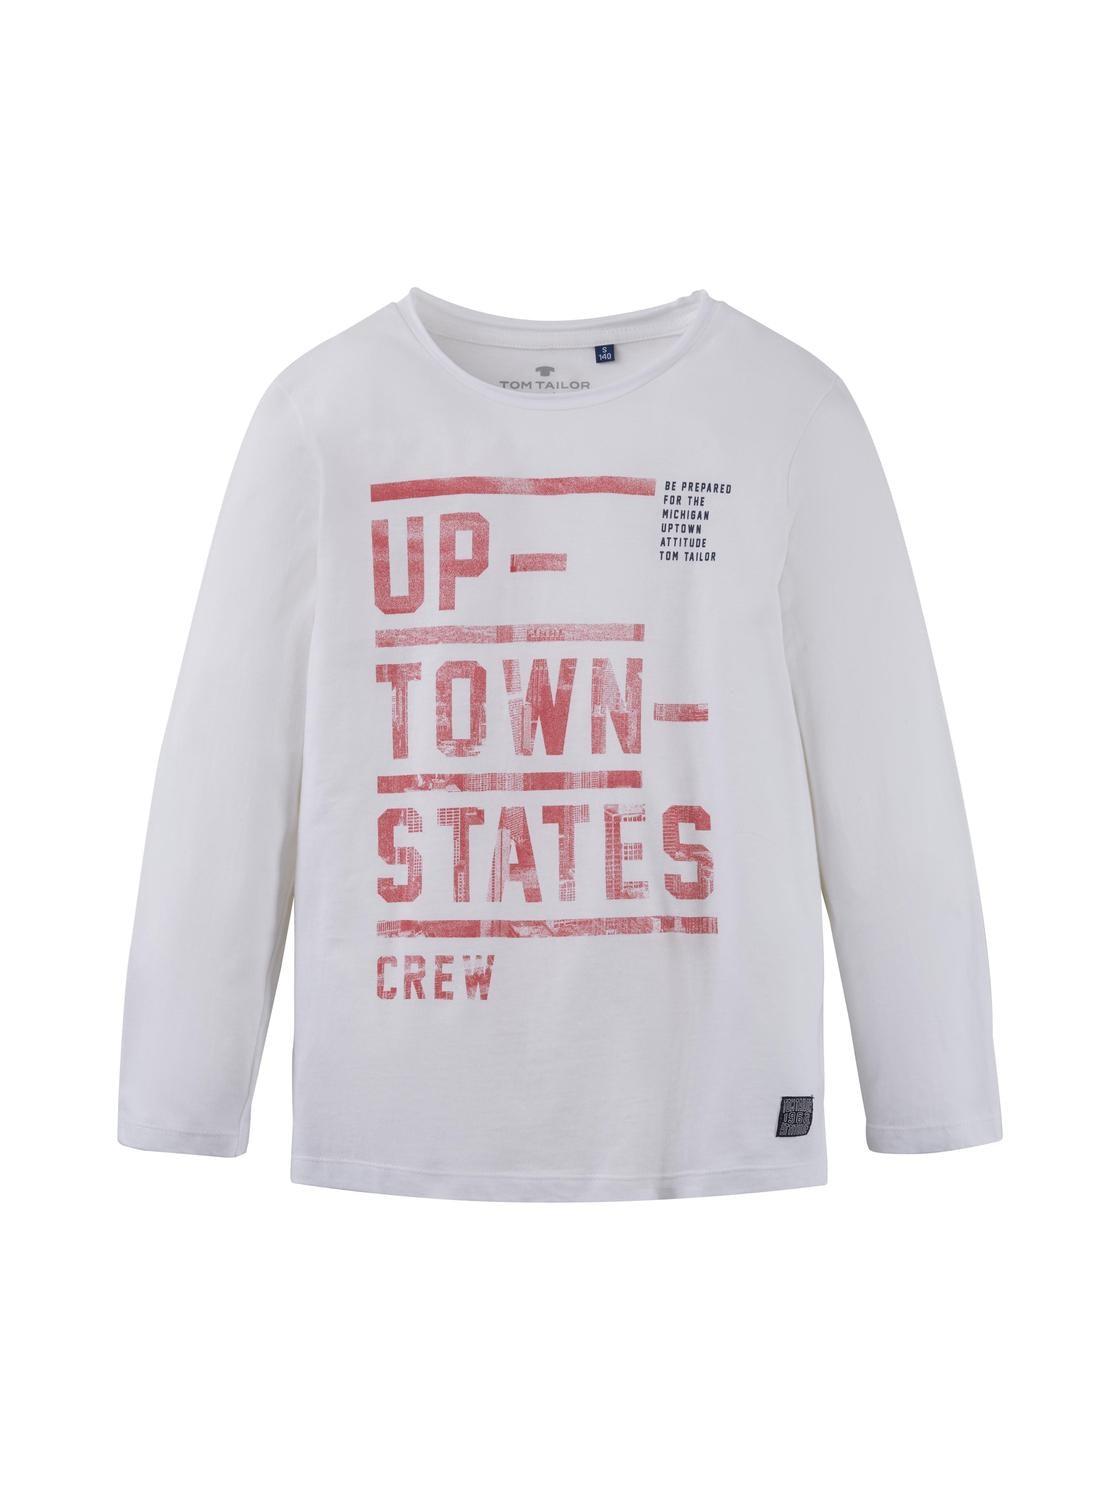 T-shirt placed print, bright white-white